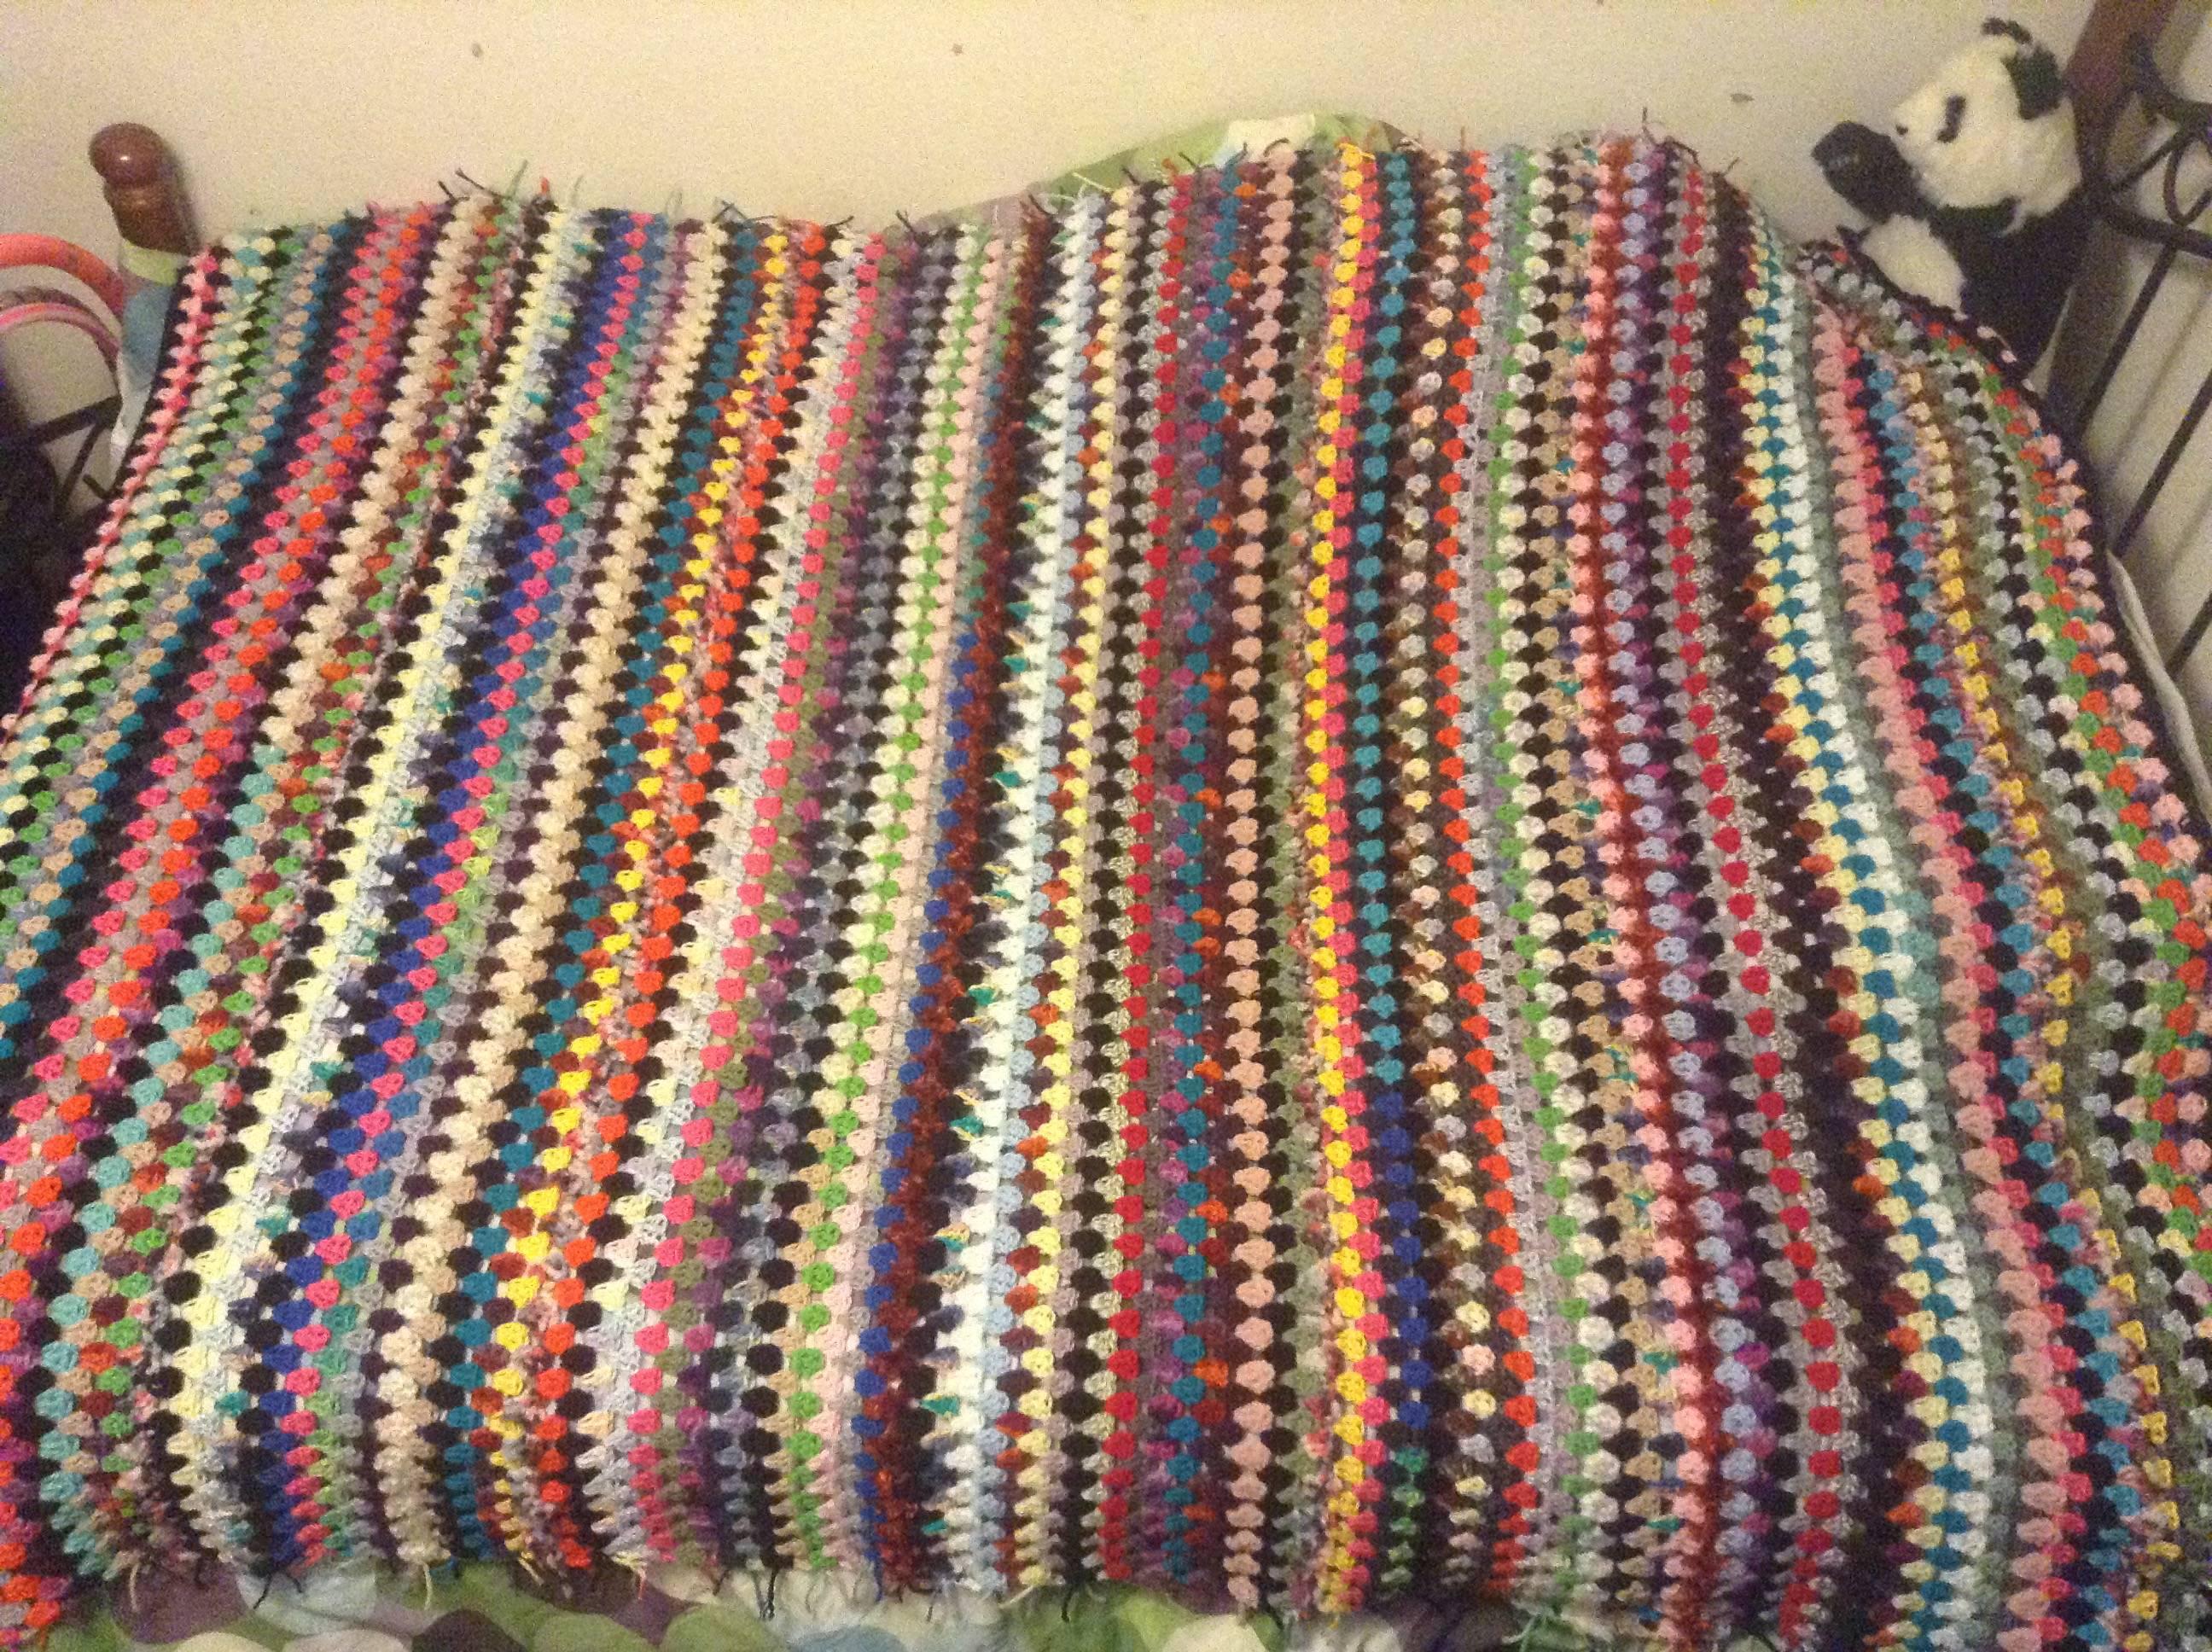 Scrapghan Crochet Free Pattern Scrap I Did It My Scrapghan Made Only From Scrap Yarn Crochet